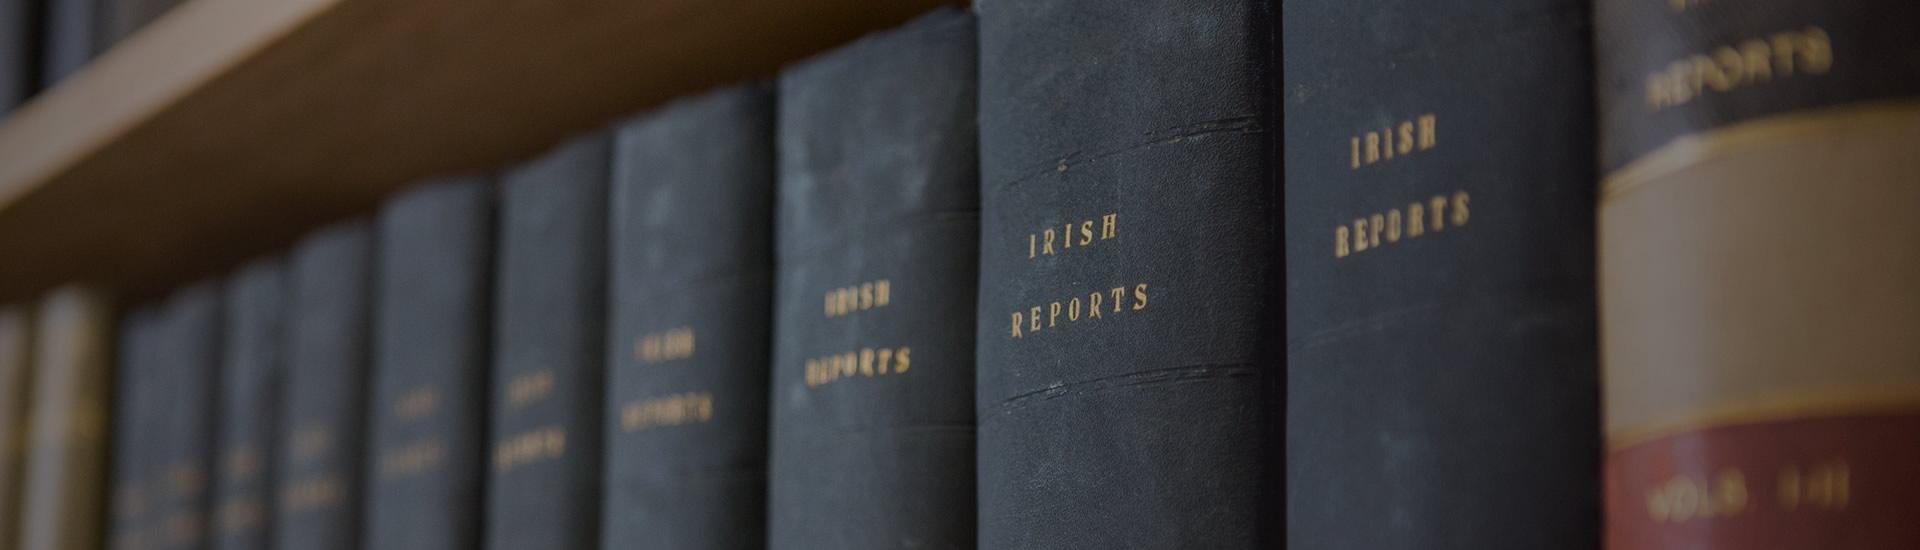 Row of Books on Irish Business Law